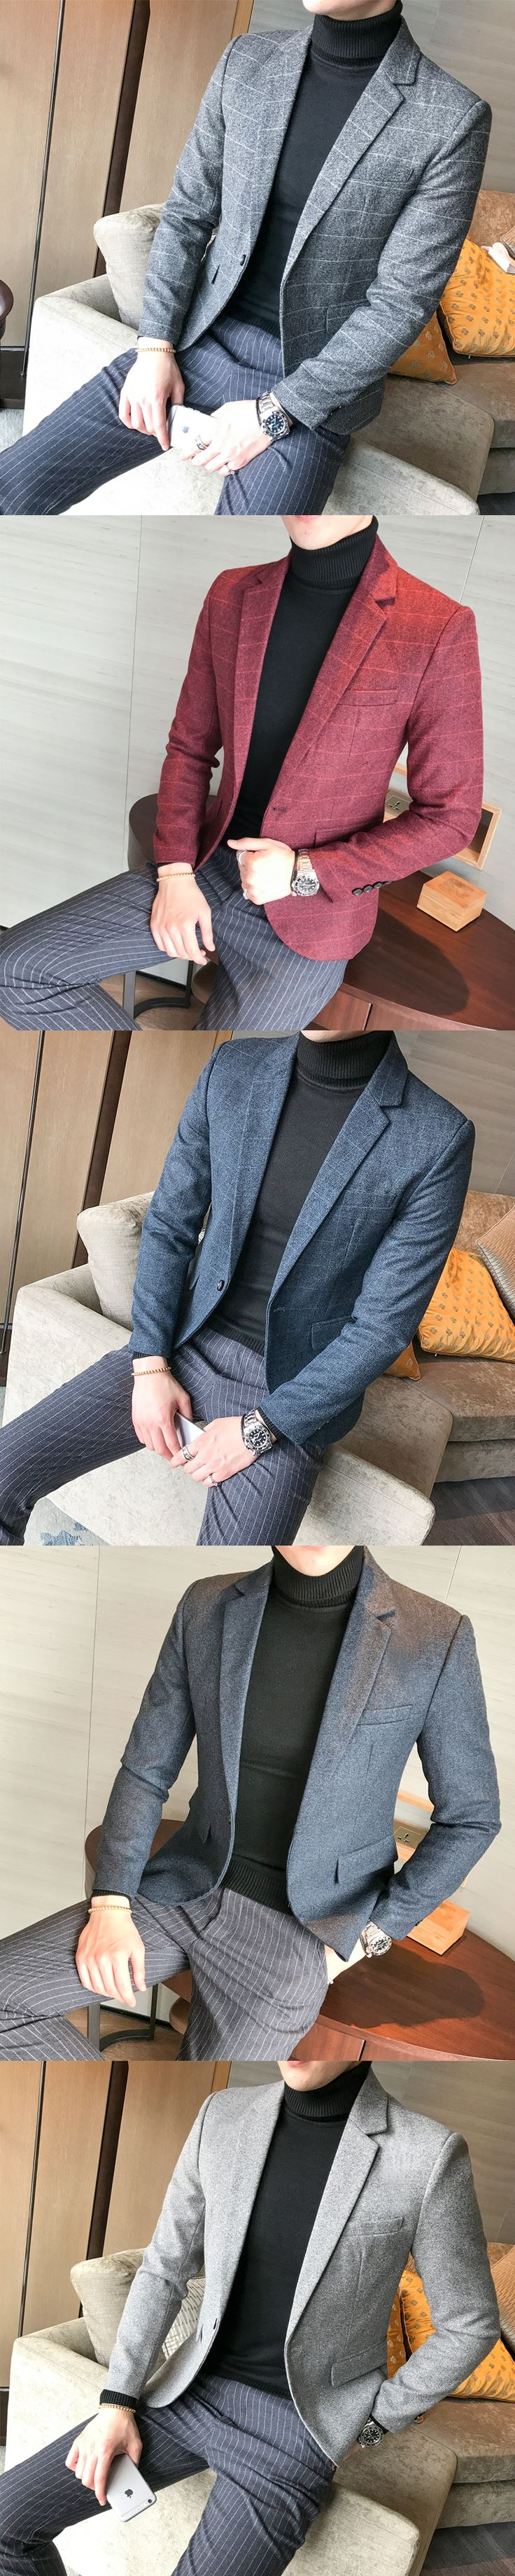 British Men Blazer Autumn New Plus Size Plaid Wedding Dress Suit Men Fashion Slim Fit Long Sleeved Business Casual Blazers Mens